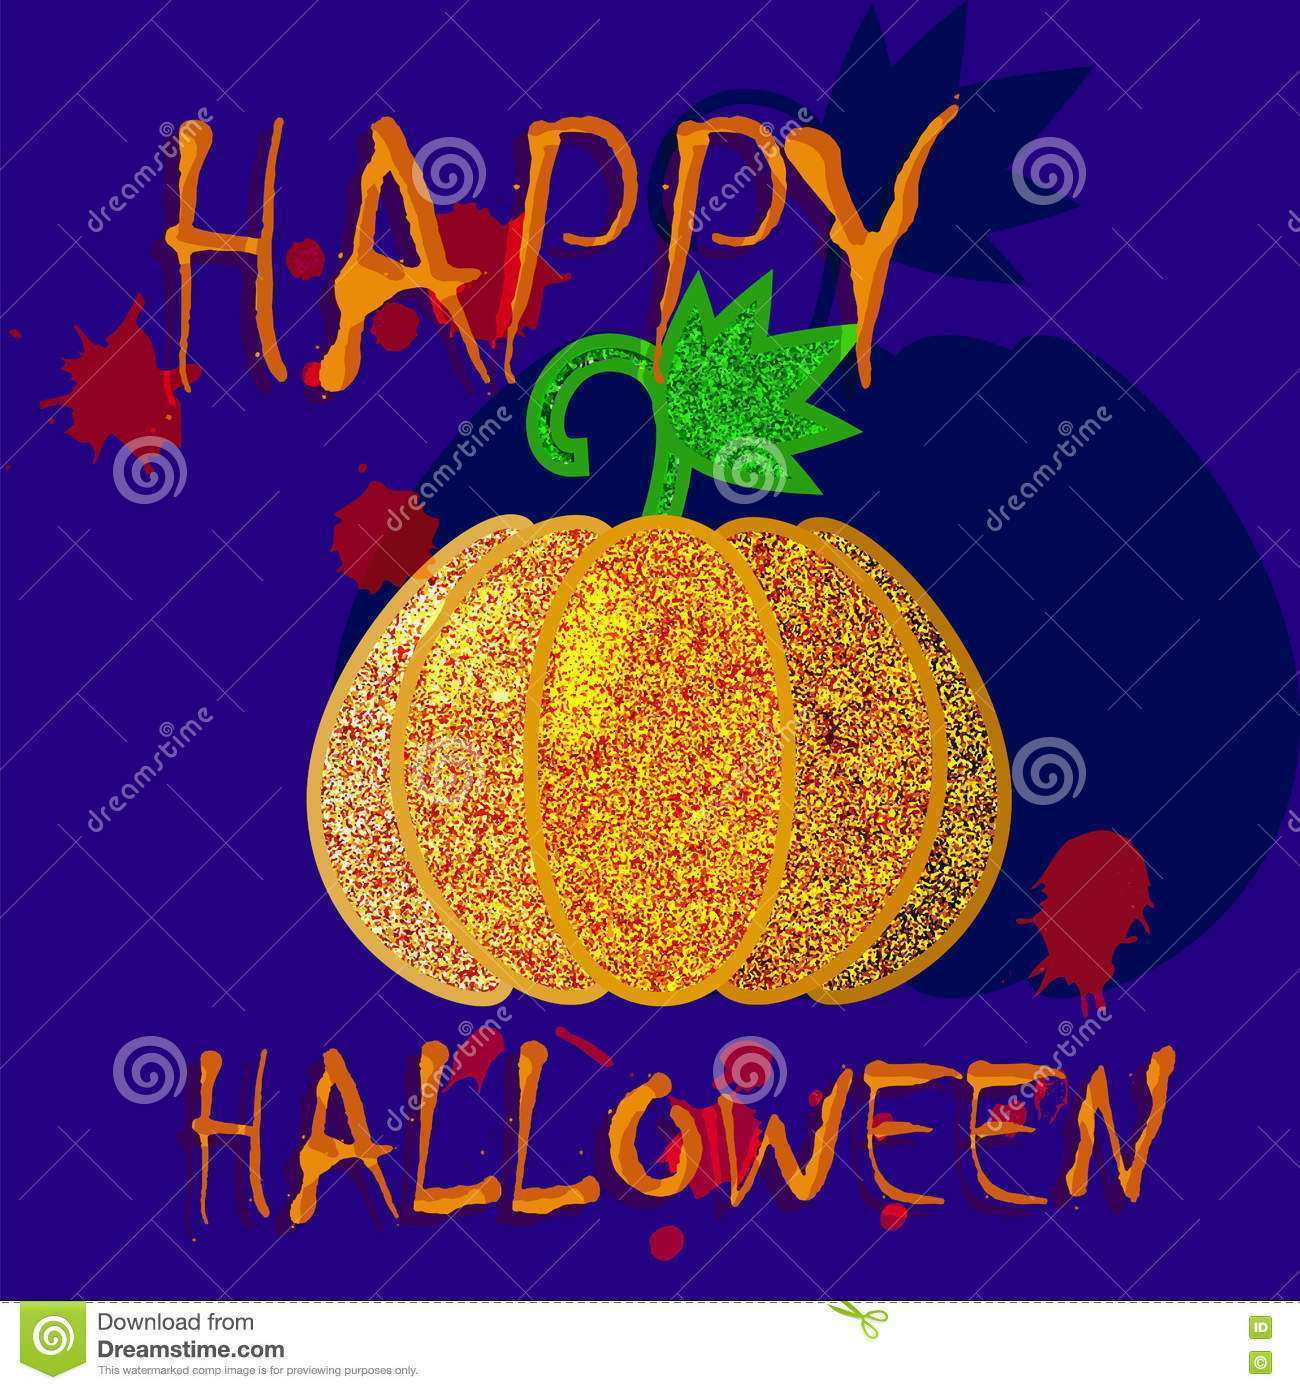 59 Free Halloween Postcard Template Free in Photoshop with Halloween Postcard Template Free